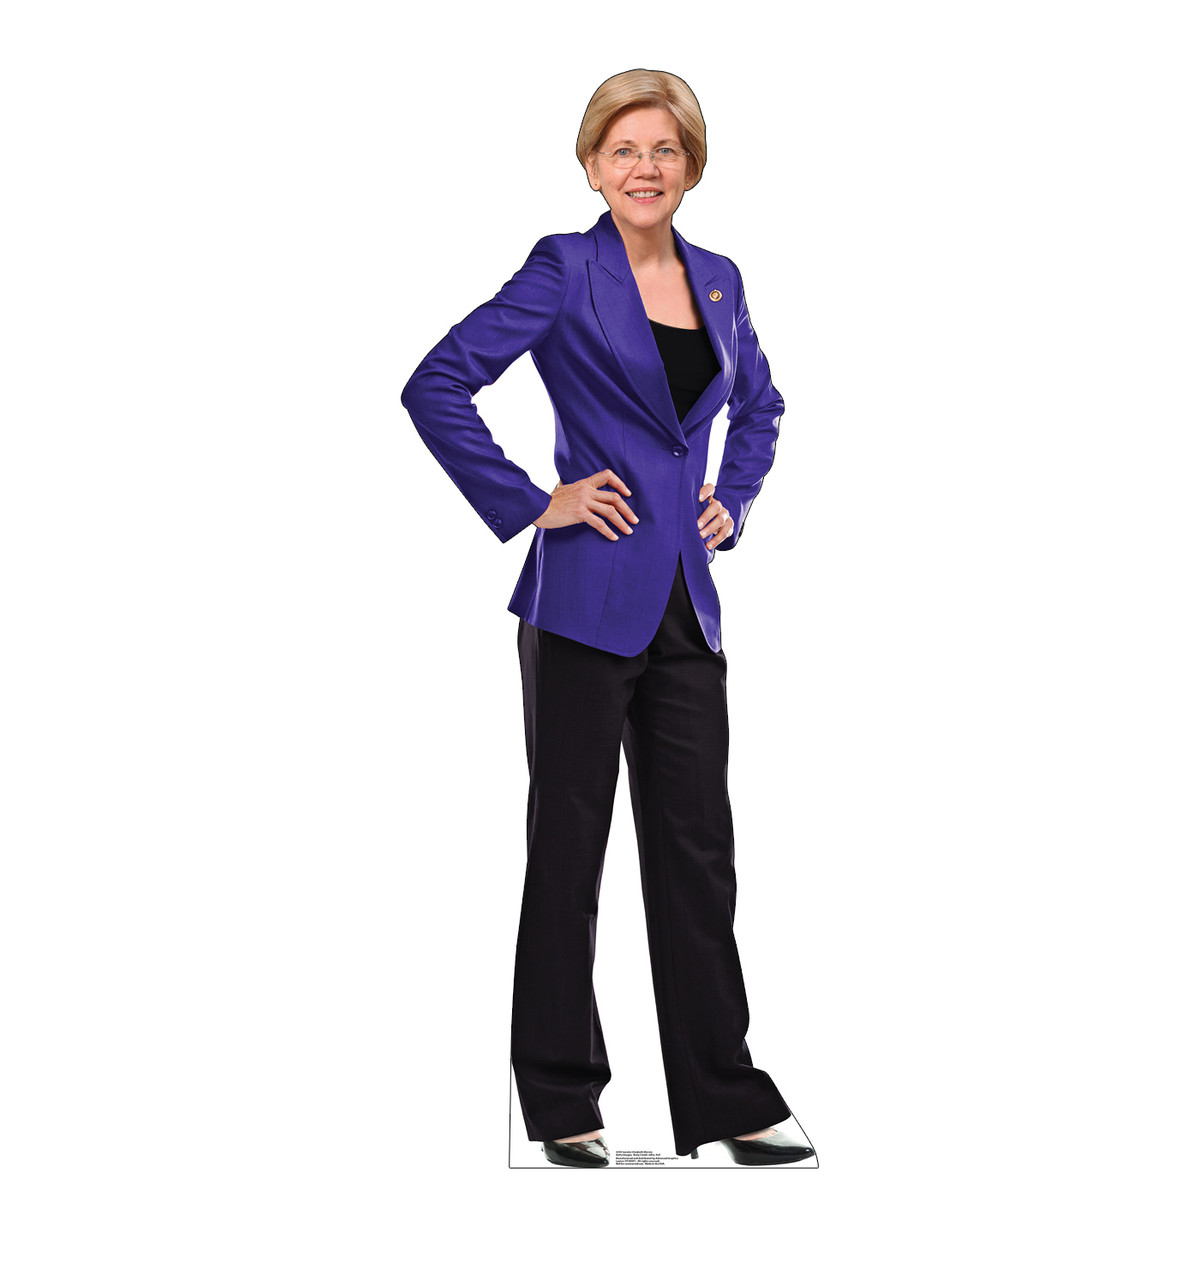 Life-size cardboard standee of Senator Elizabeth Warren.